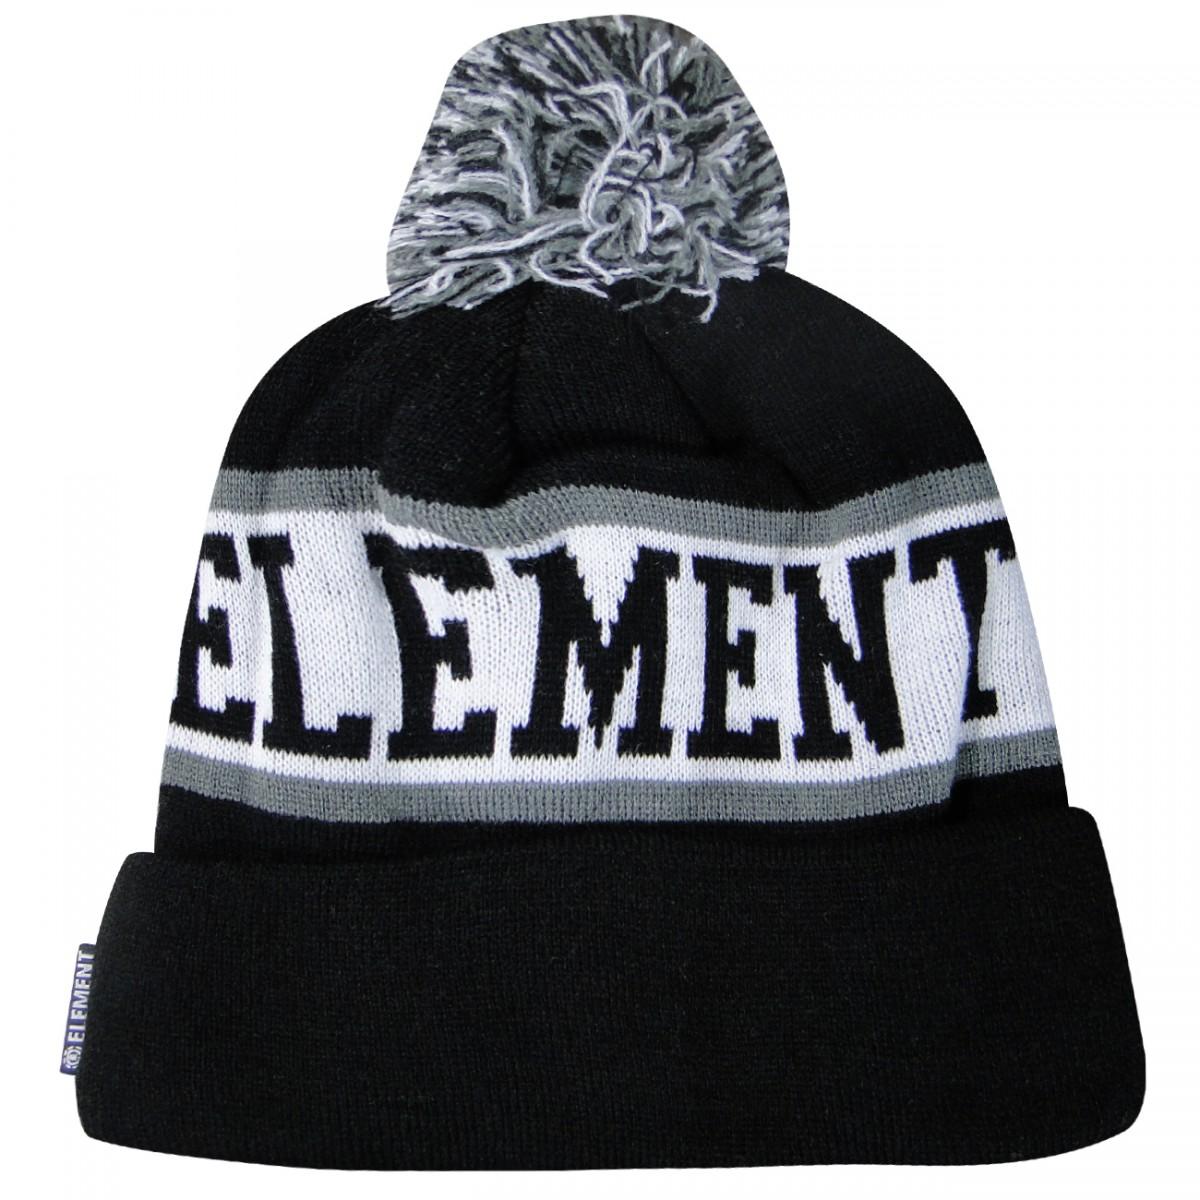 e1a81dcb87c5d Touca Element Fairfax MABNCFAI - Preto Chumbo - Chuteira Nike ...